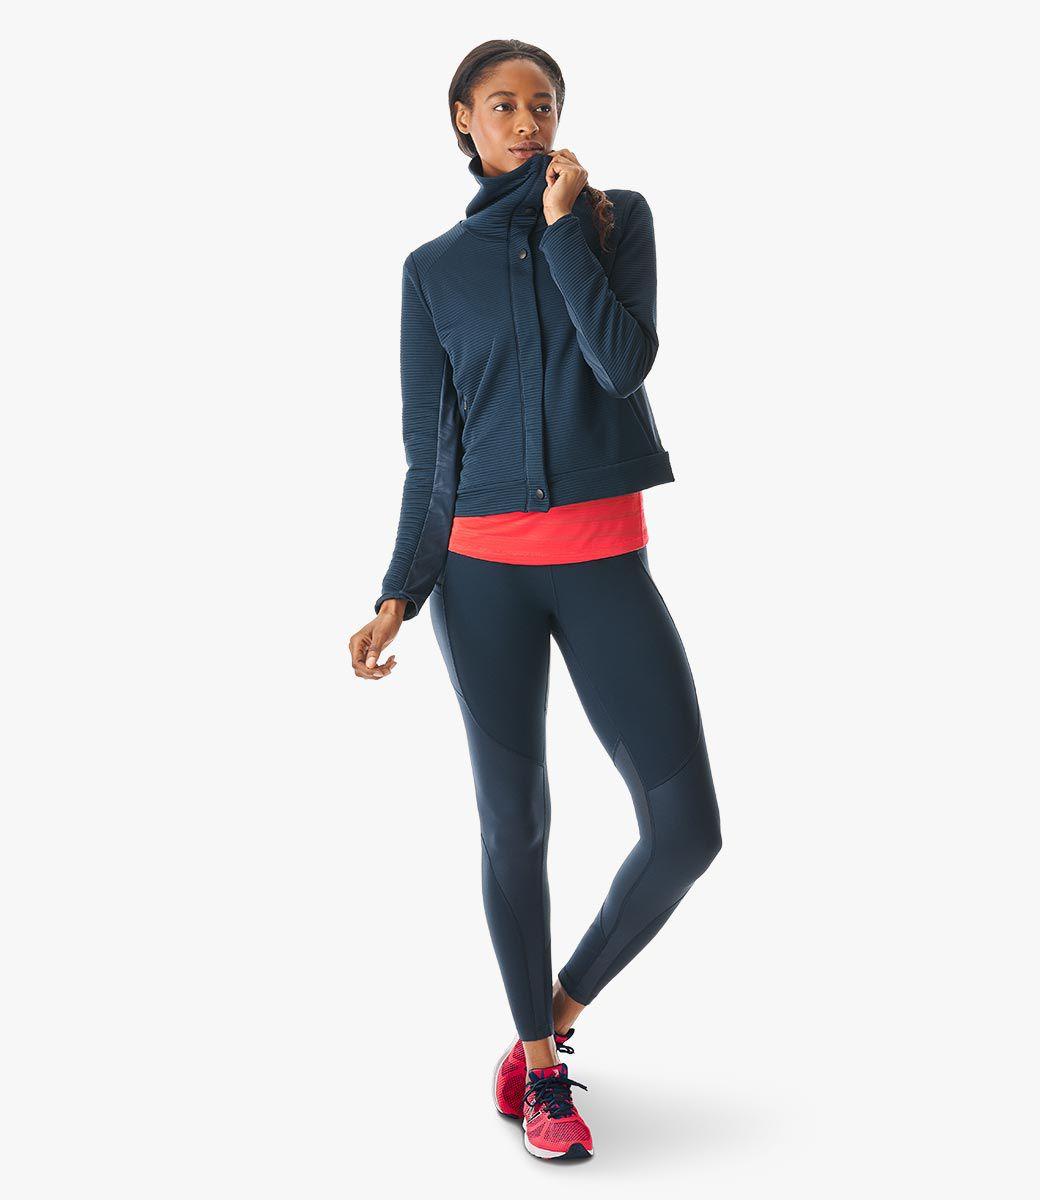 New Balance Womens July Vazee Transform Performance Fashion,